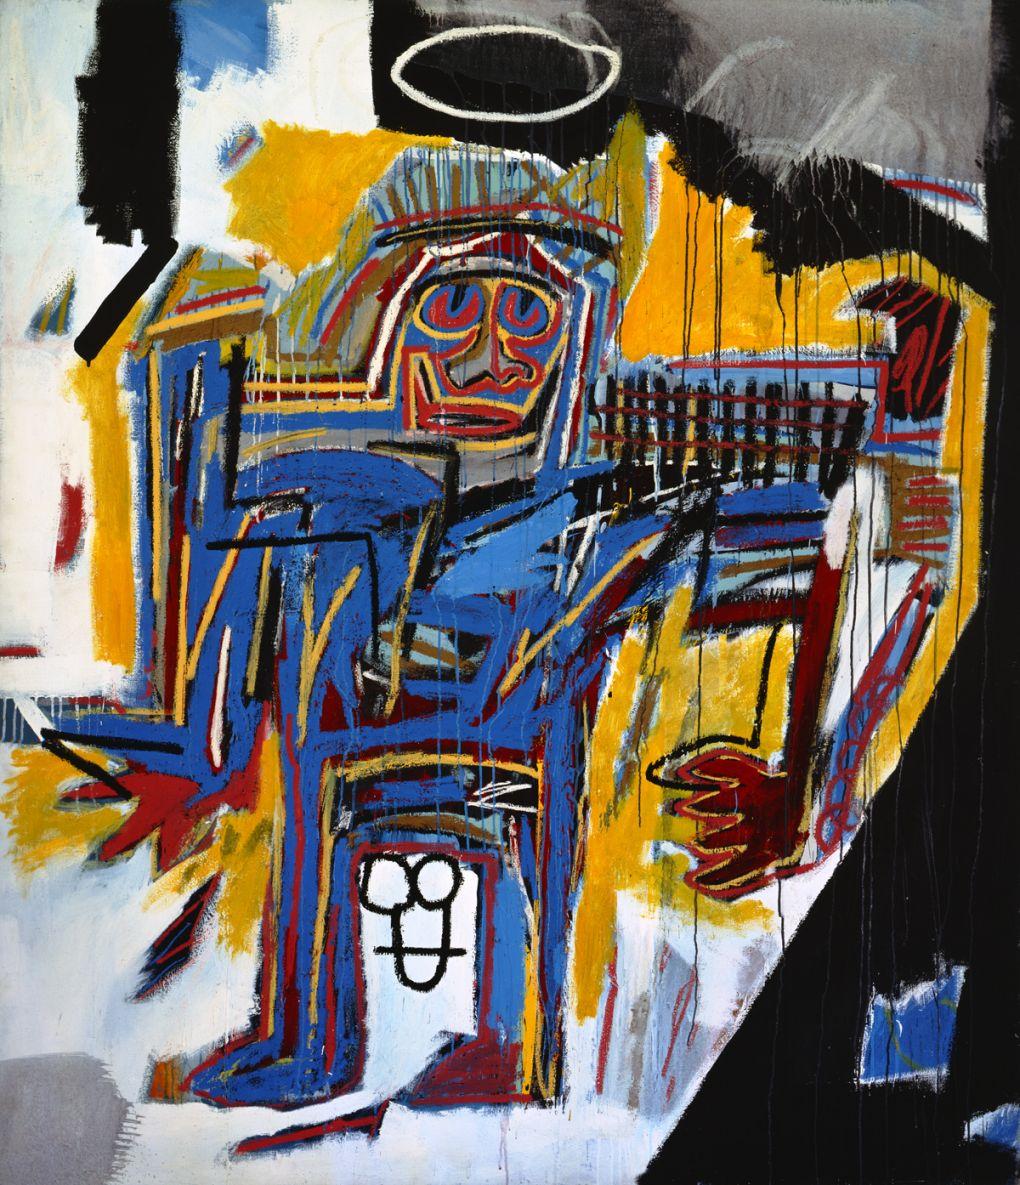 Pater (1982) - Jean-Michel Basquiat